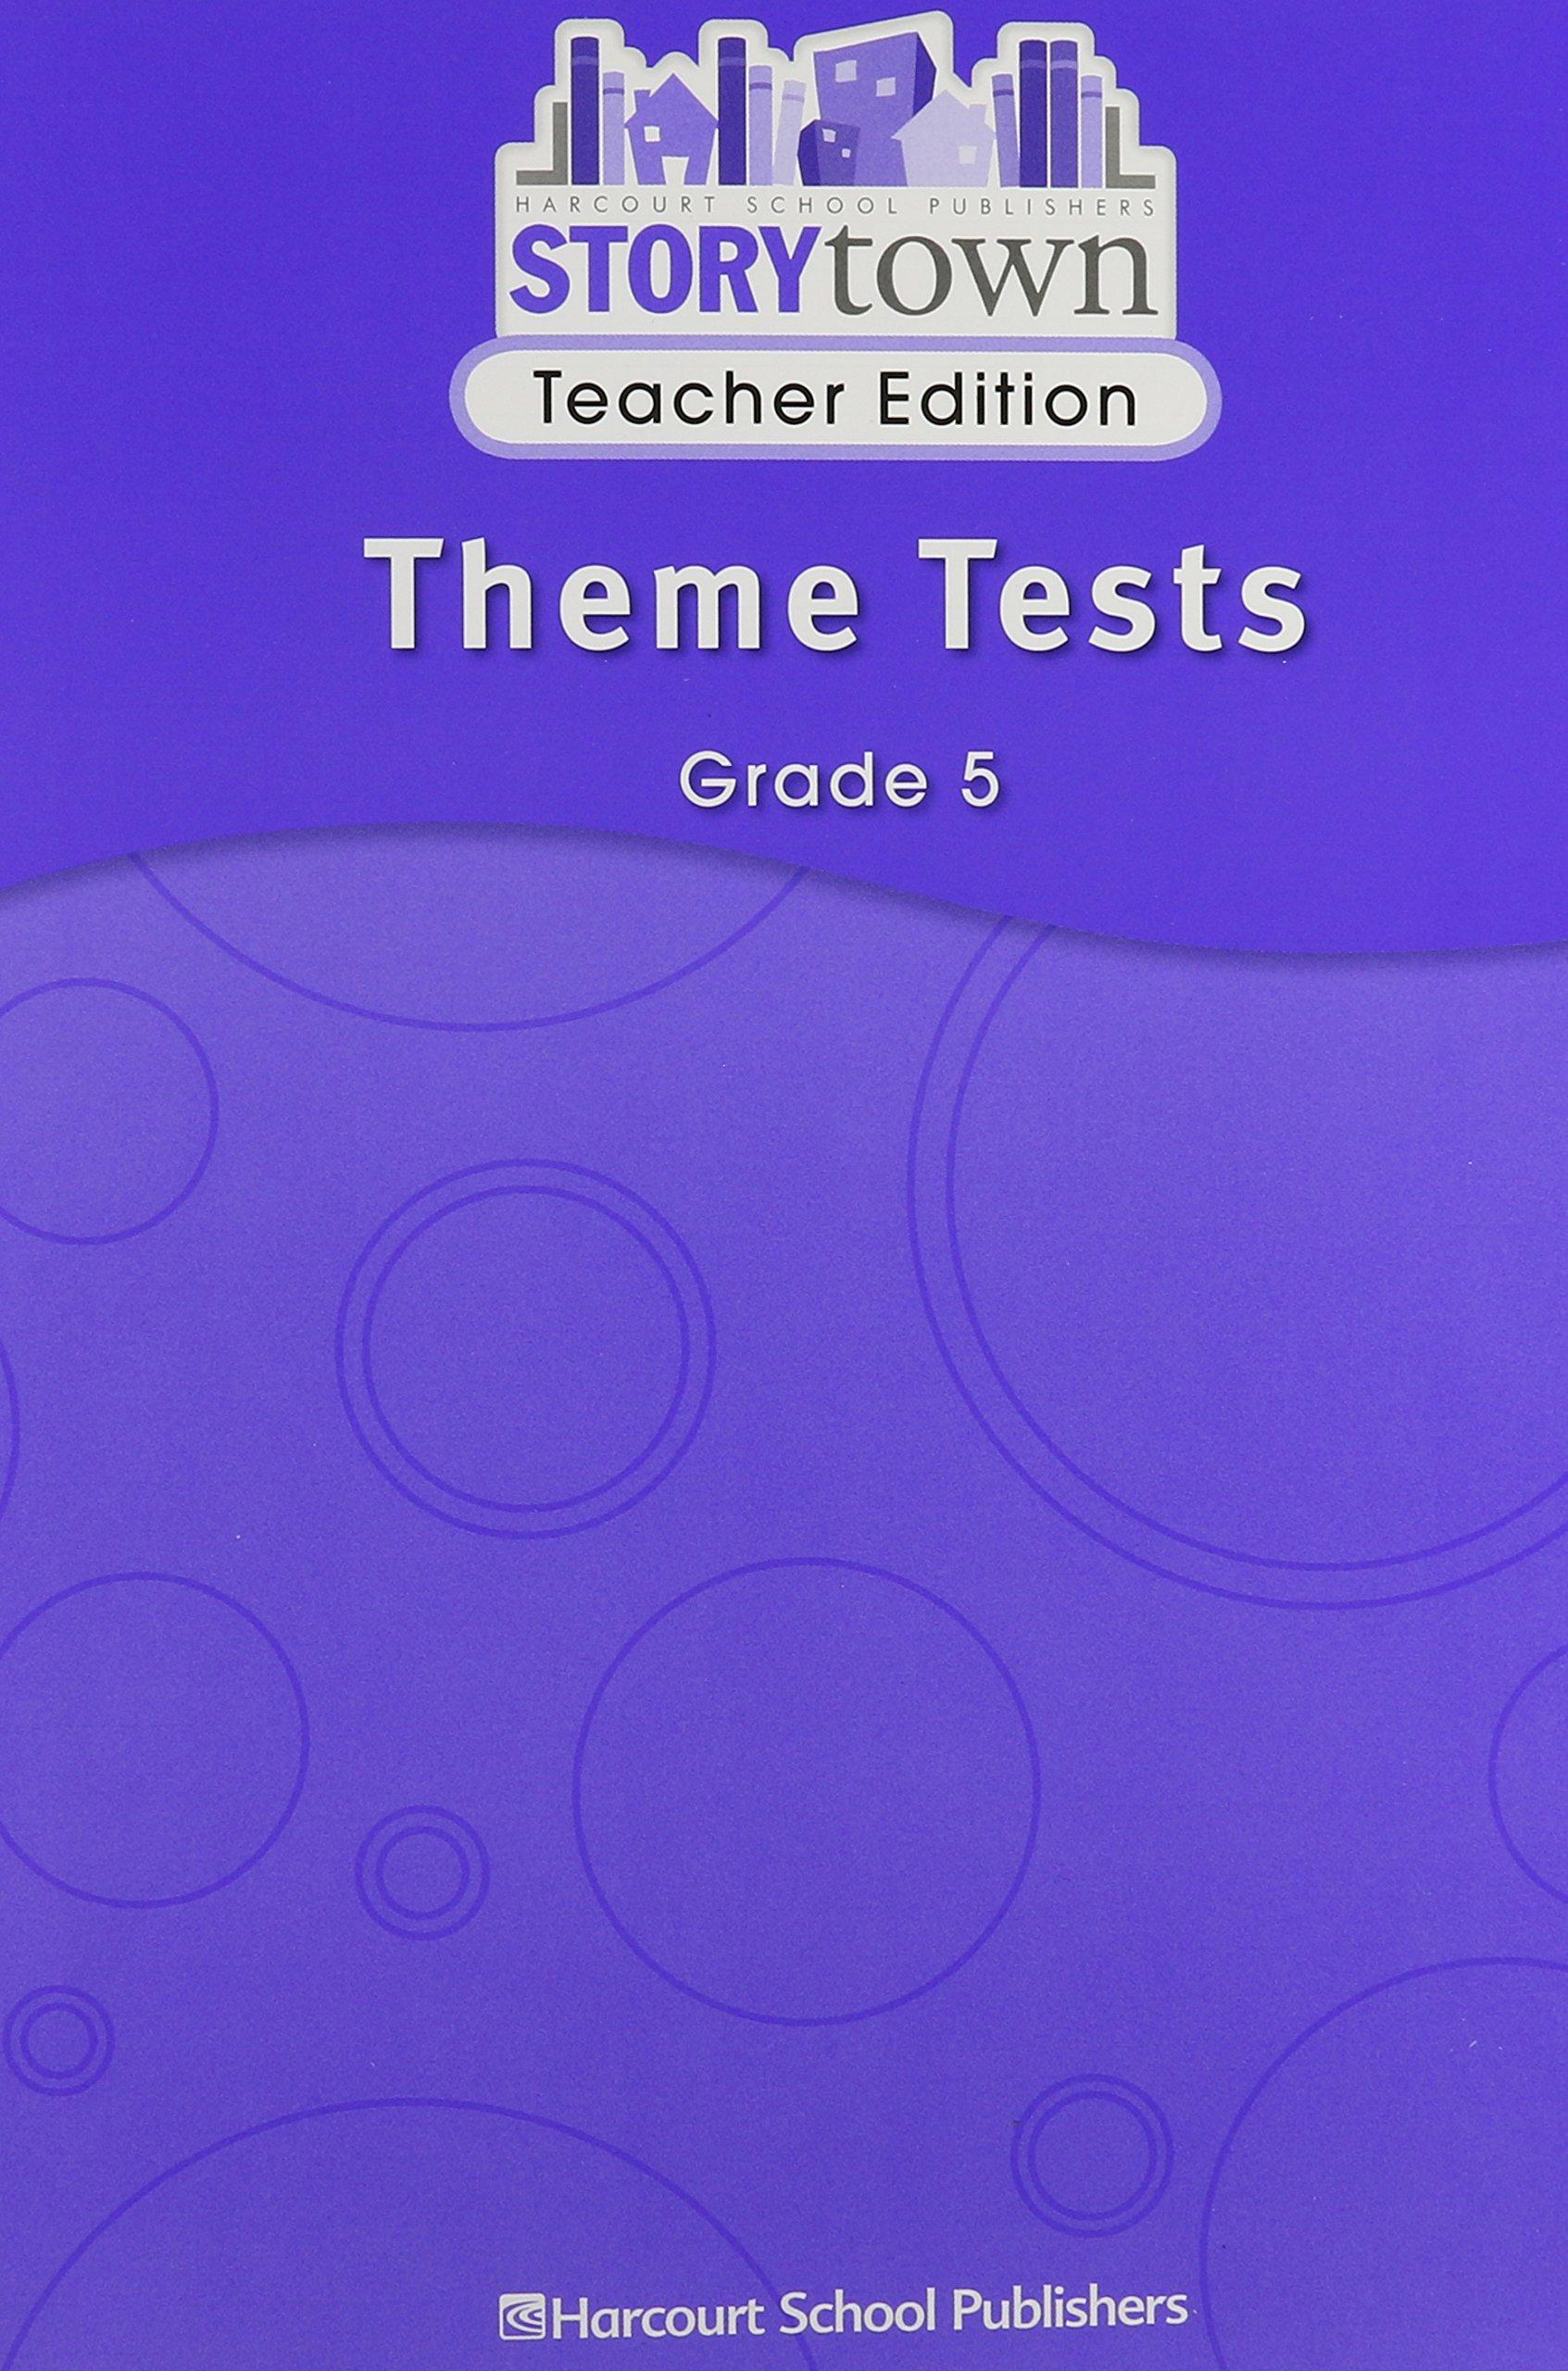 Storytown Theme Tests, Grade 5, Teacher Edition: ROGER C. FARR:  9780153587511: Amazon.com: Books